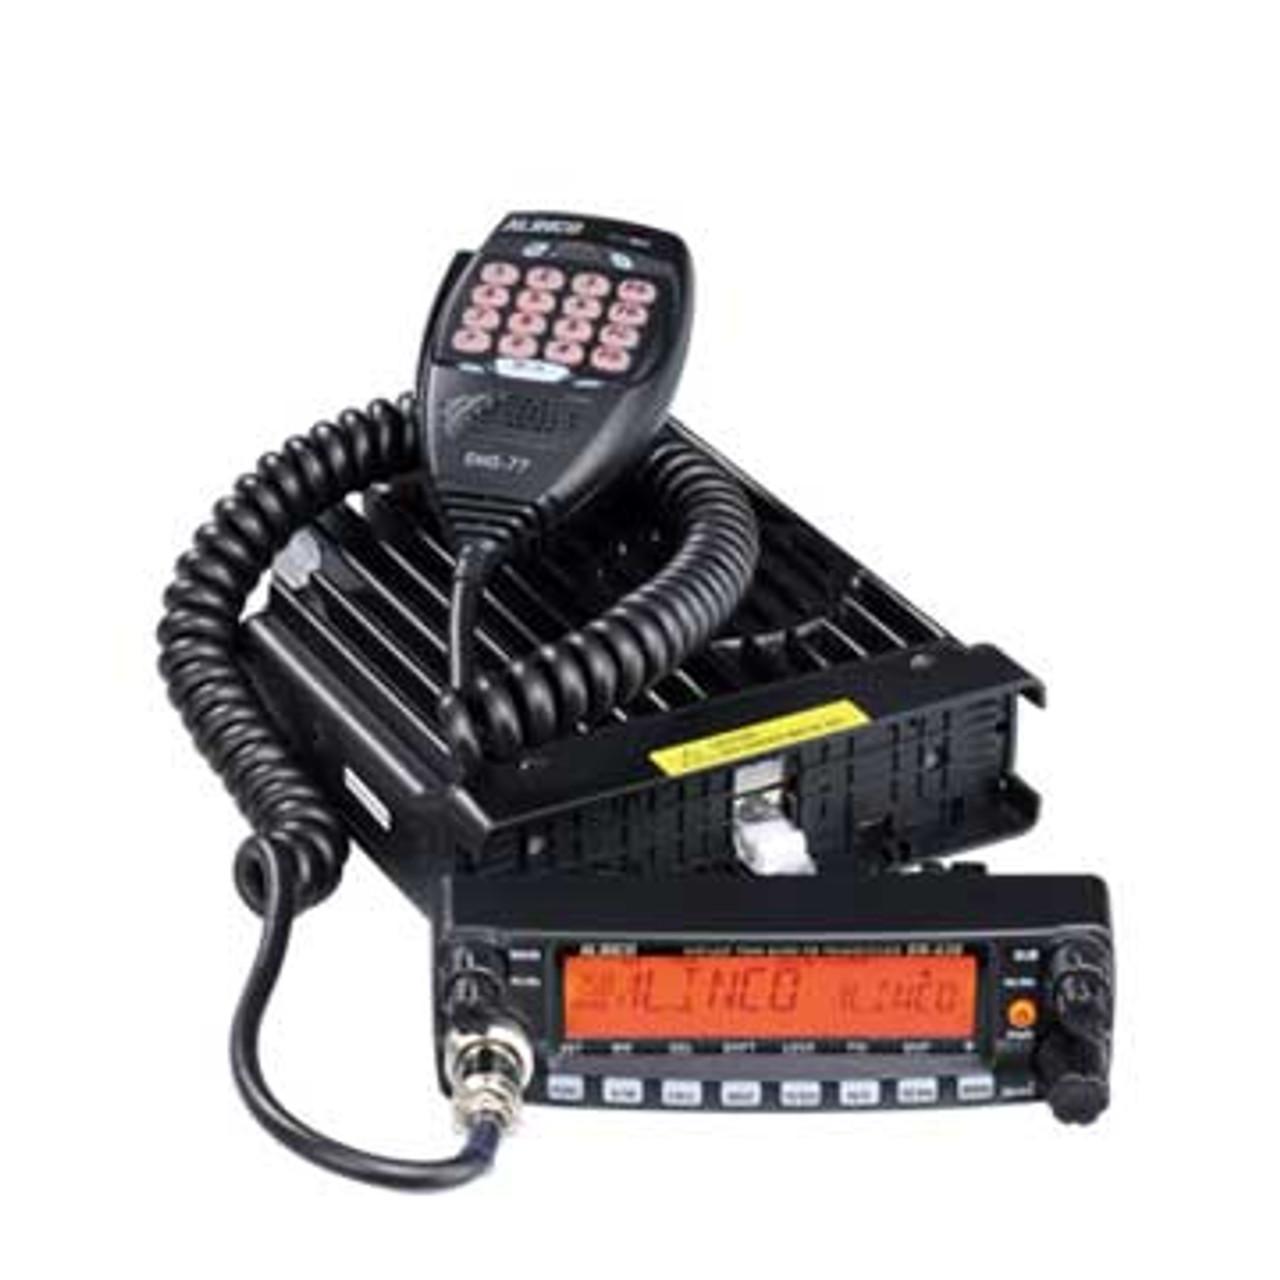 Alinco DR-638T Dual Band FM Mobile